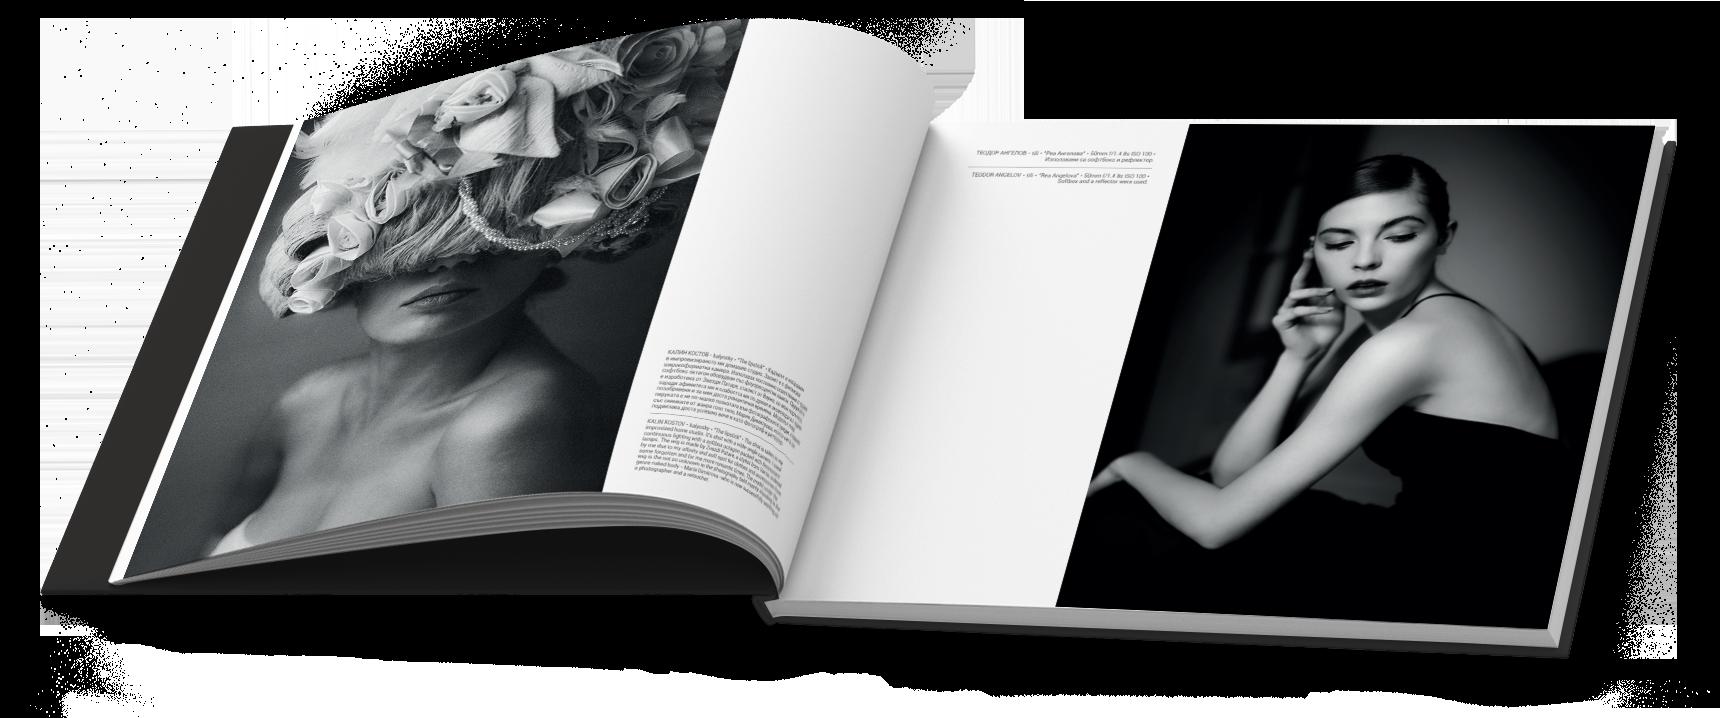 Фотографски Албум 2018 г. - Black&White &Color - страници 84-85